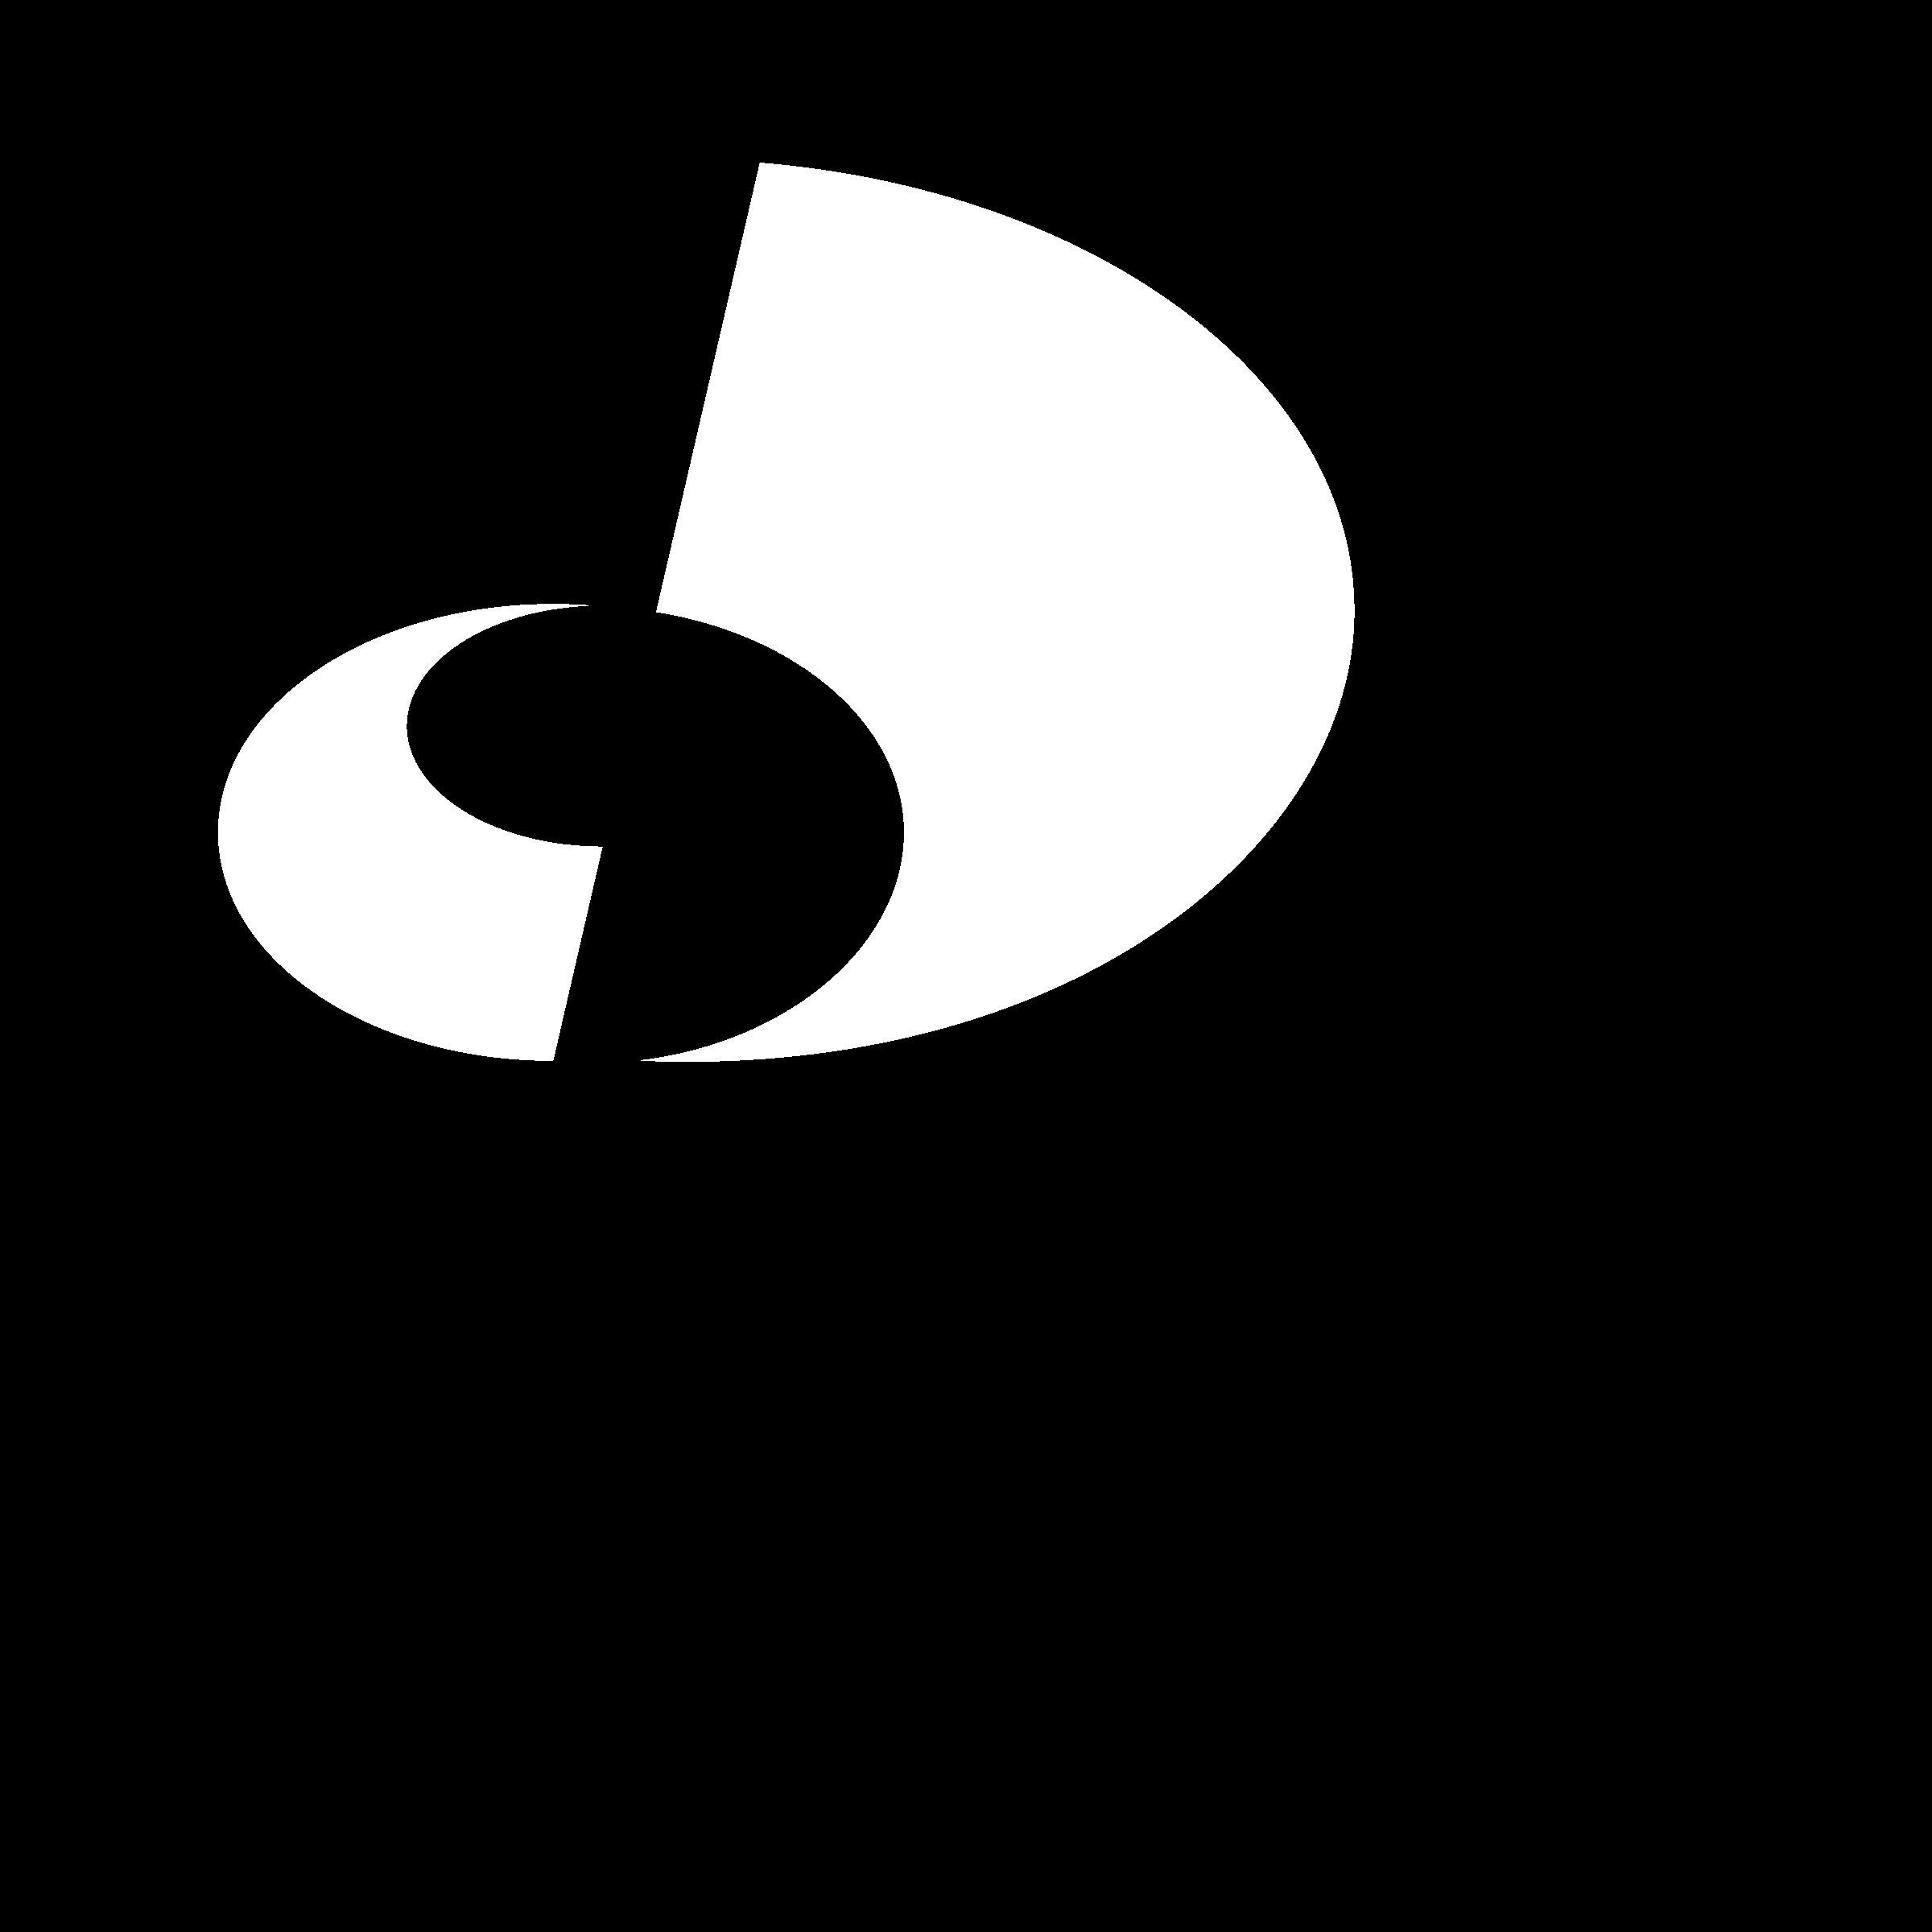 Dqe Vector Supply Svg Transparent Logo Png Freebie amp; -